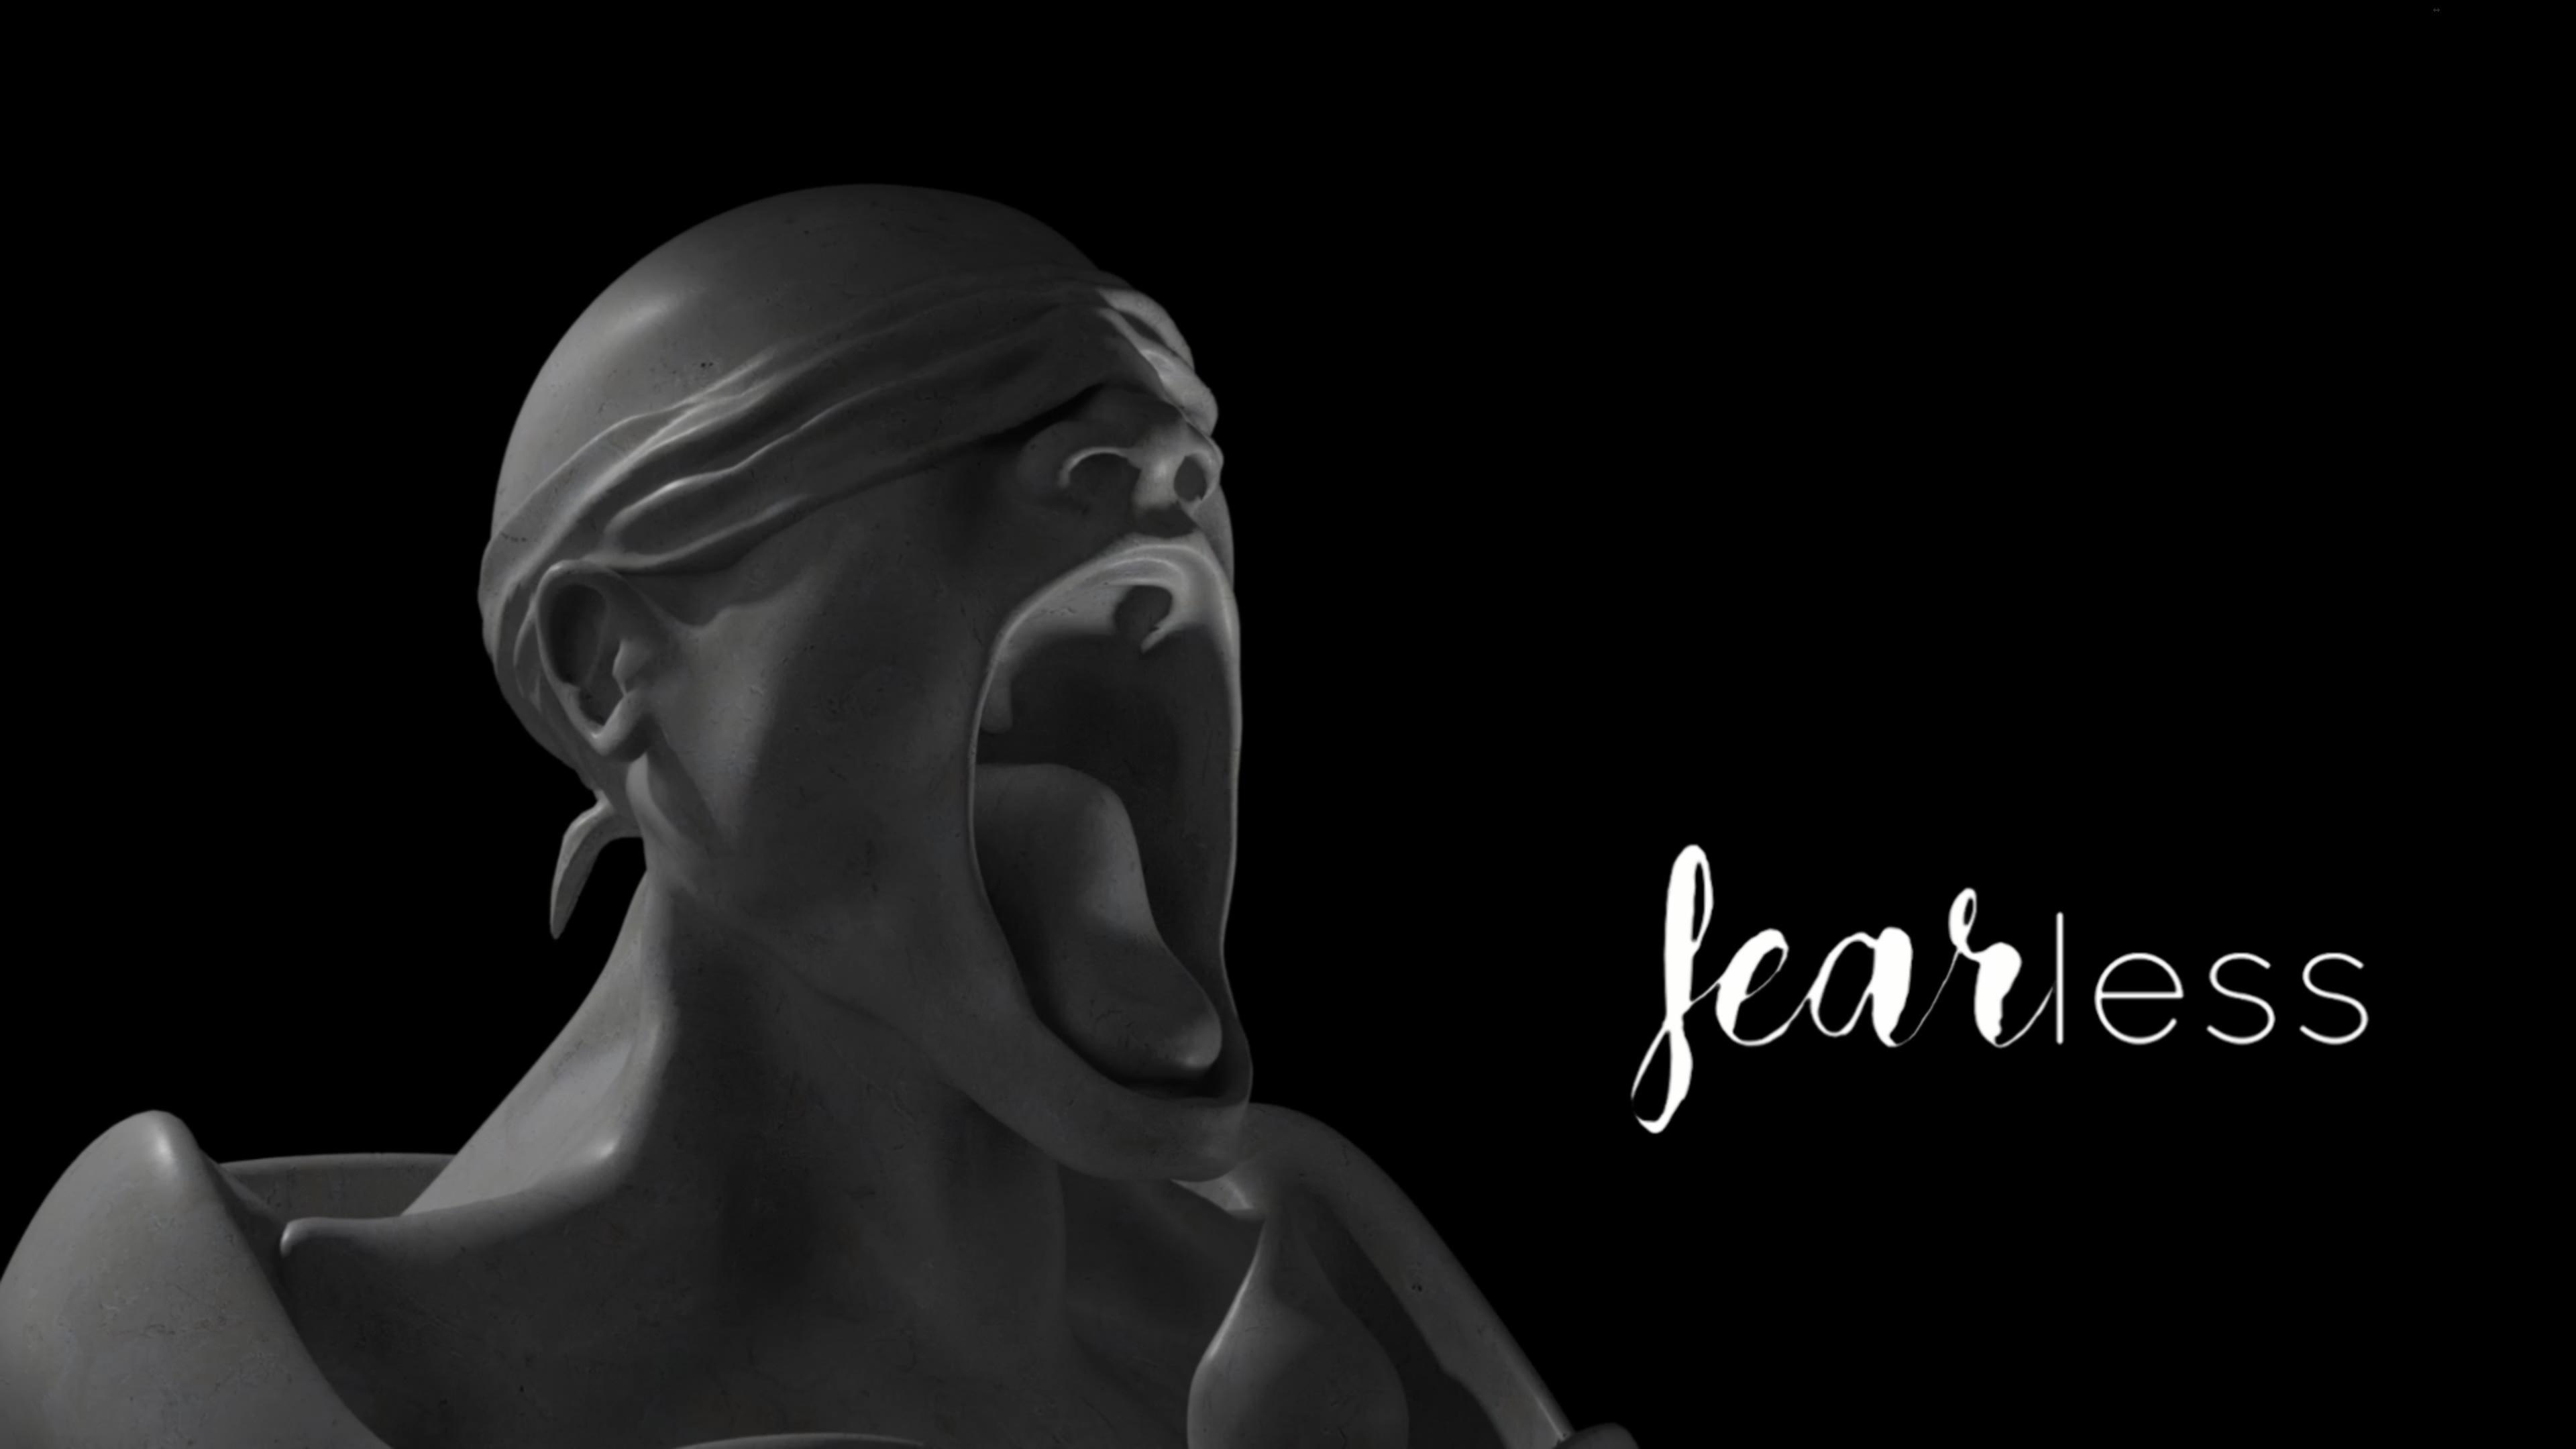 xszlama_norbert_fearless_1